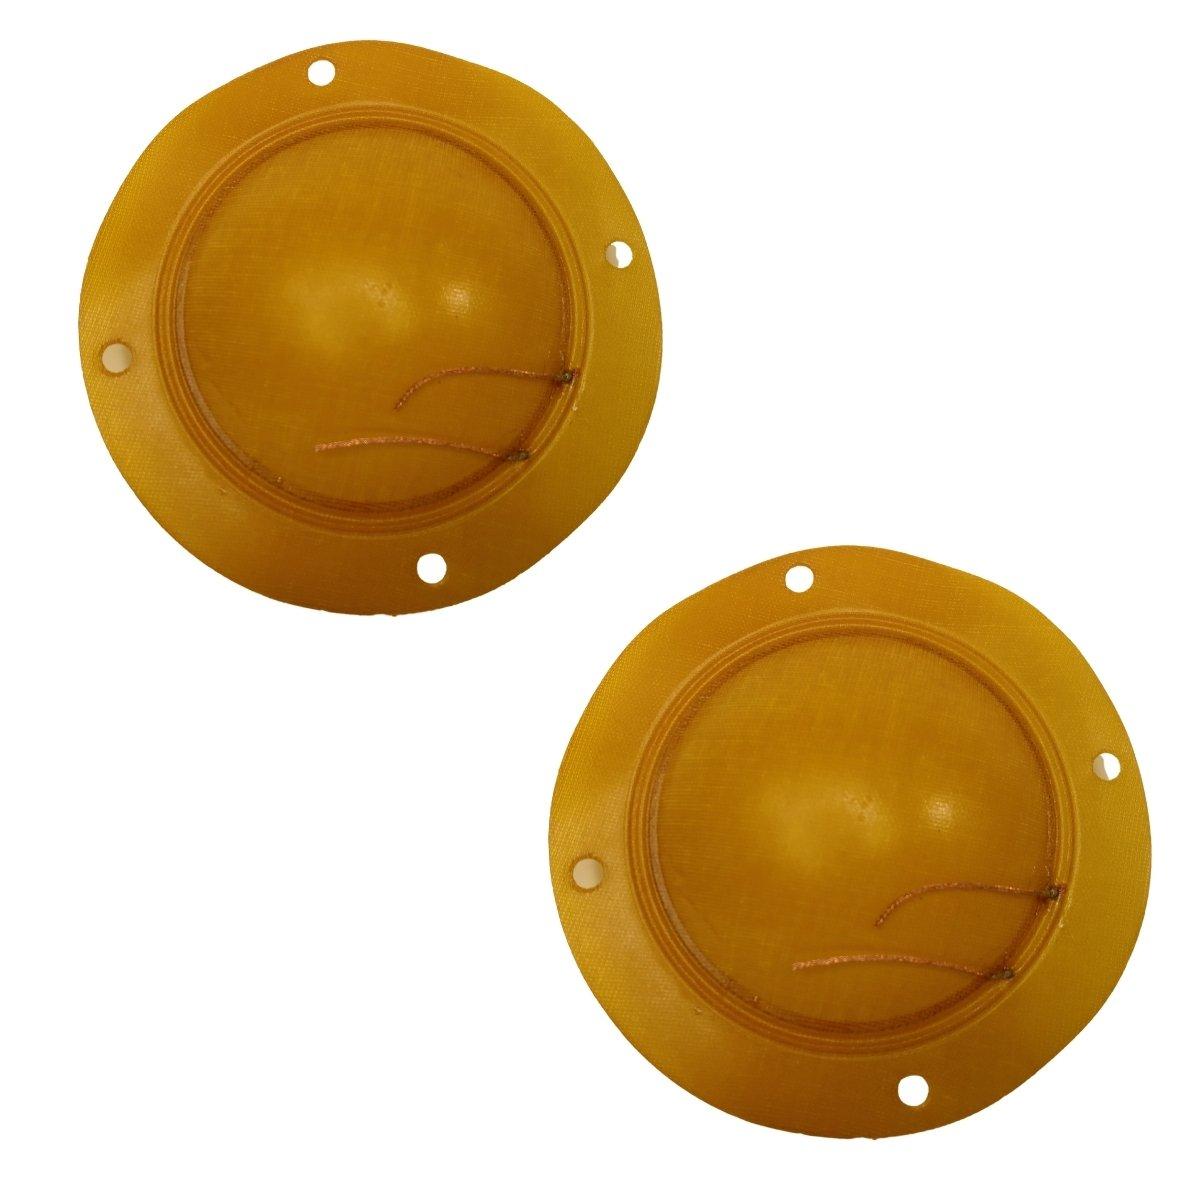 Kit 2 Unidades Membranas Parcial Reparo Driver D300 D305 8 Ohms Compatível Jarrão Corneta Fenólico 75W